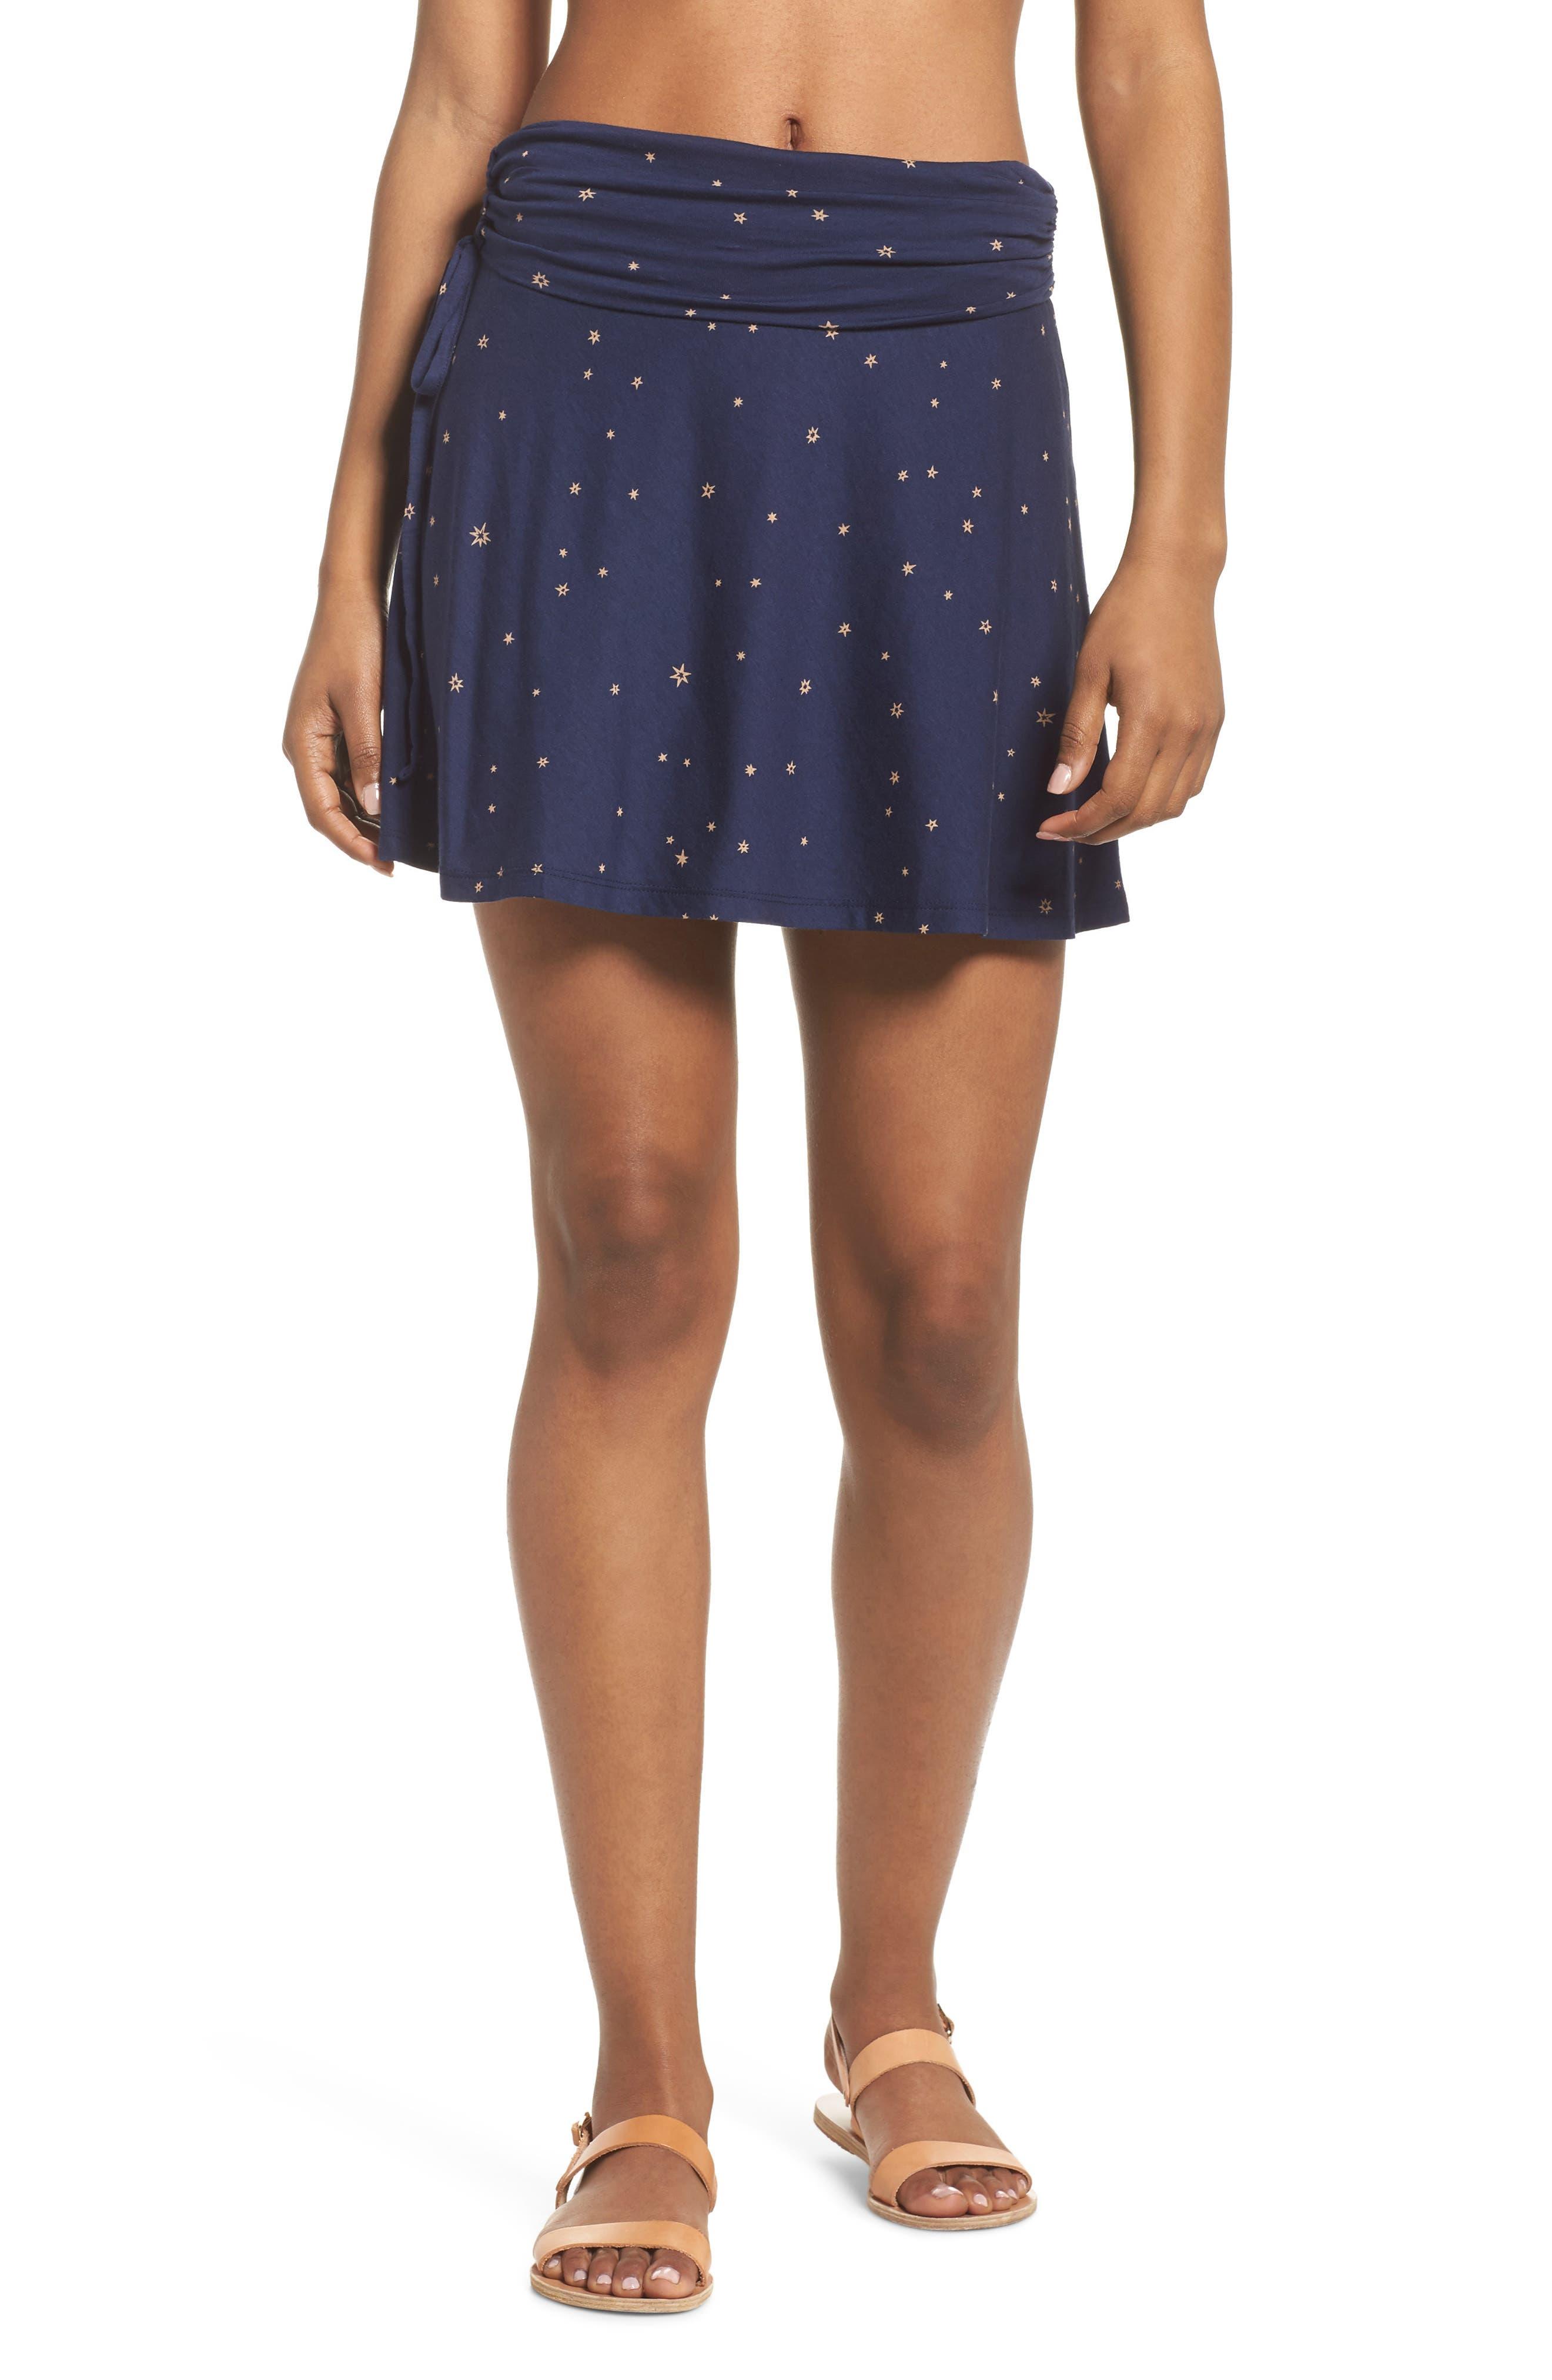 Lithia Cotton Blend Skirt,                             Main thumbnail 1, color,                             Micr Mica Pop Classic Navy